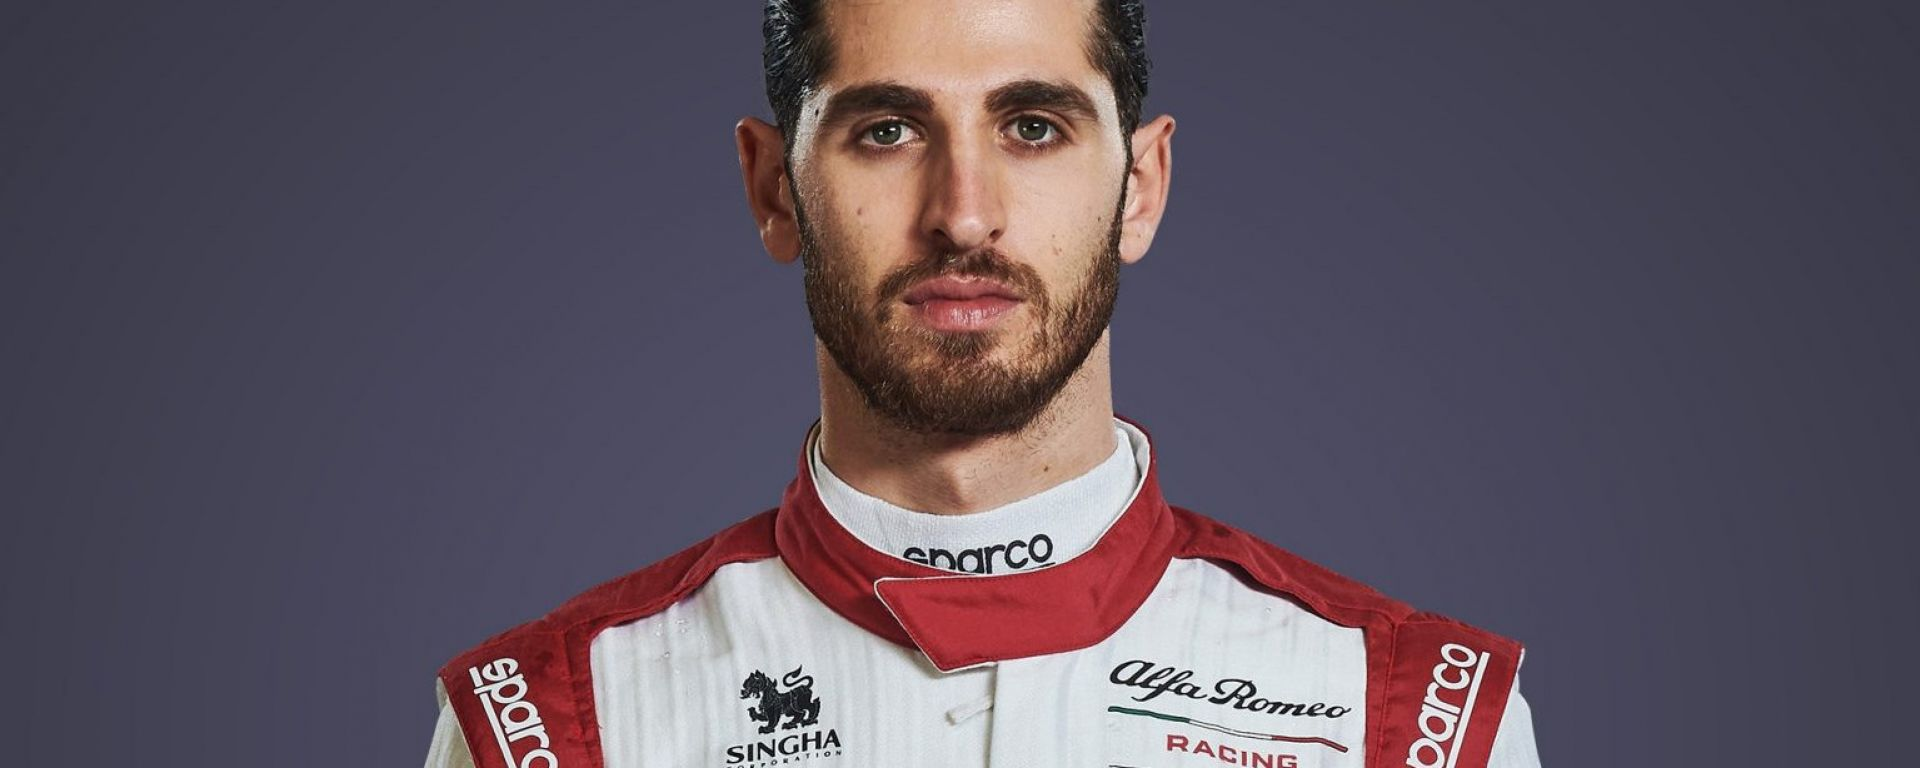 Antonio Giovinazzi #99 F1 2021